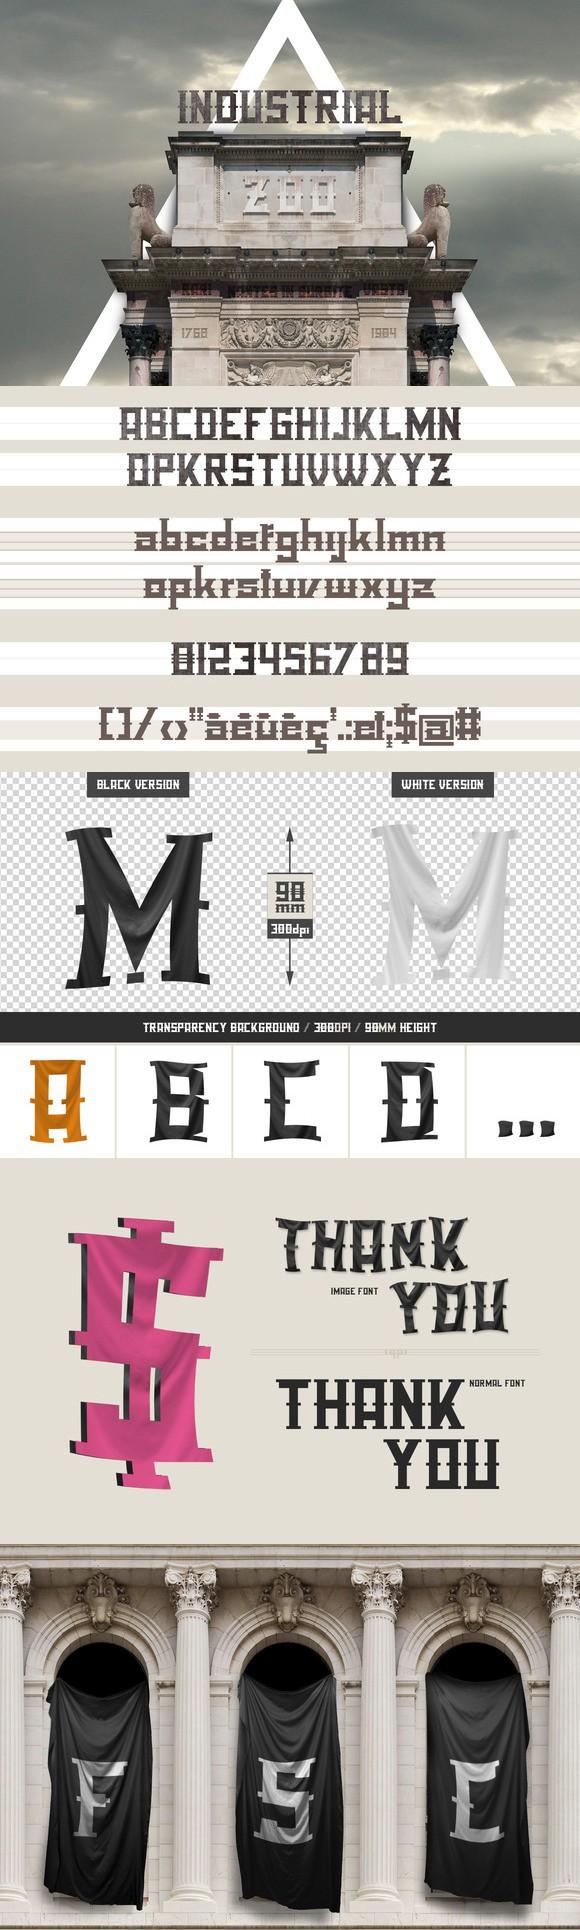 Download Industrial Zoo - font pack | Font packs, Sans serif fonts ...